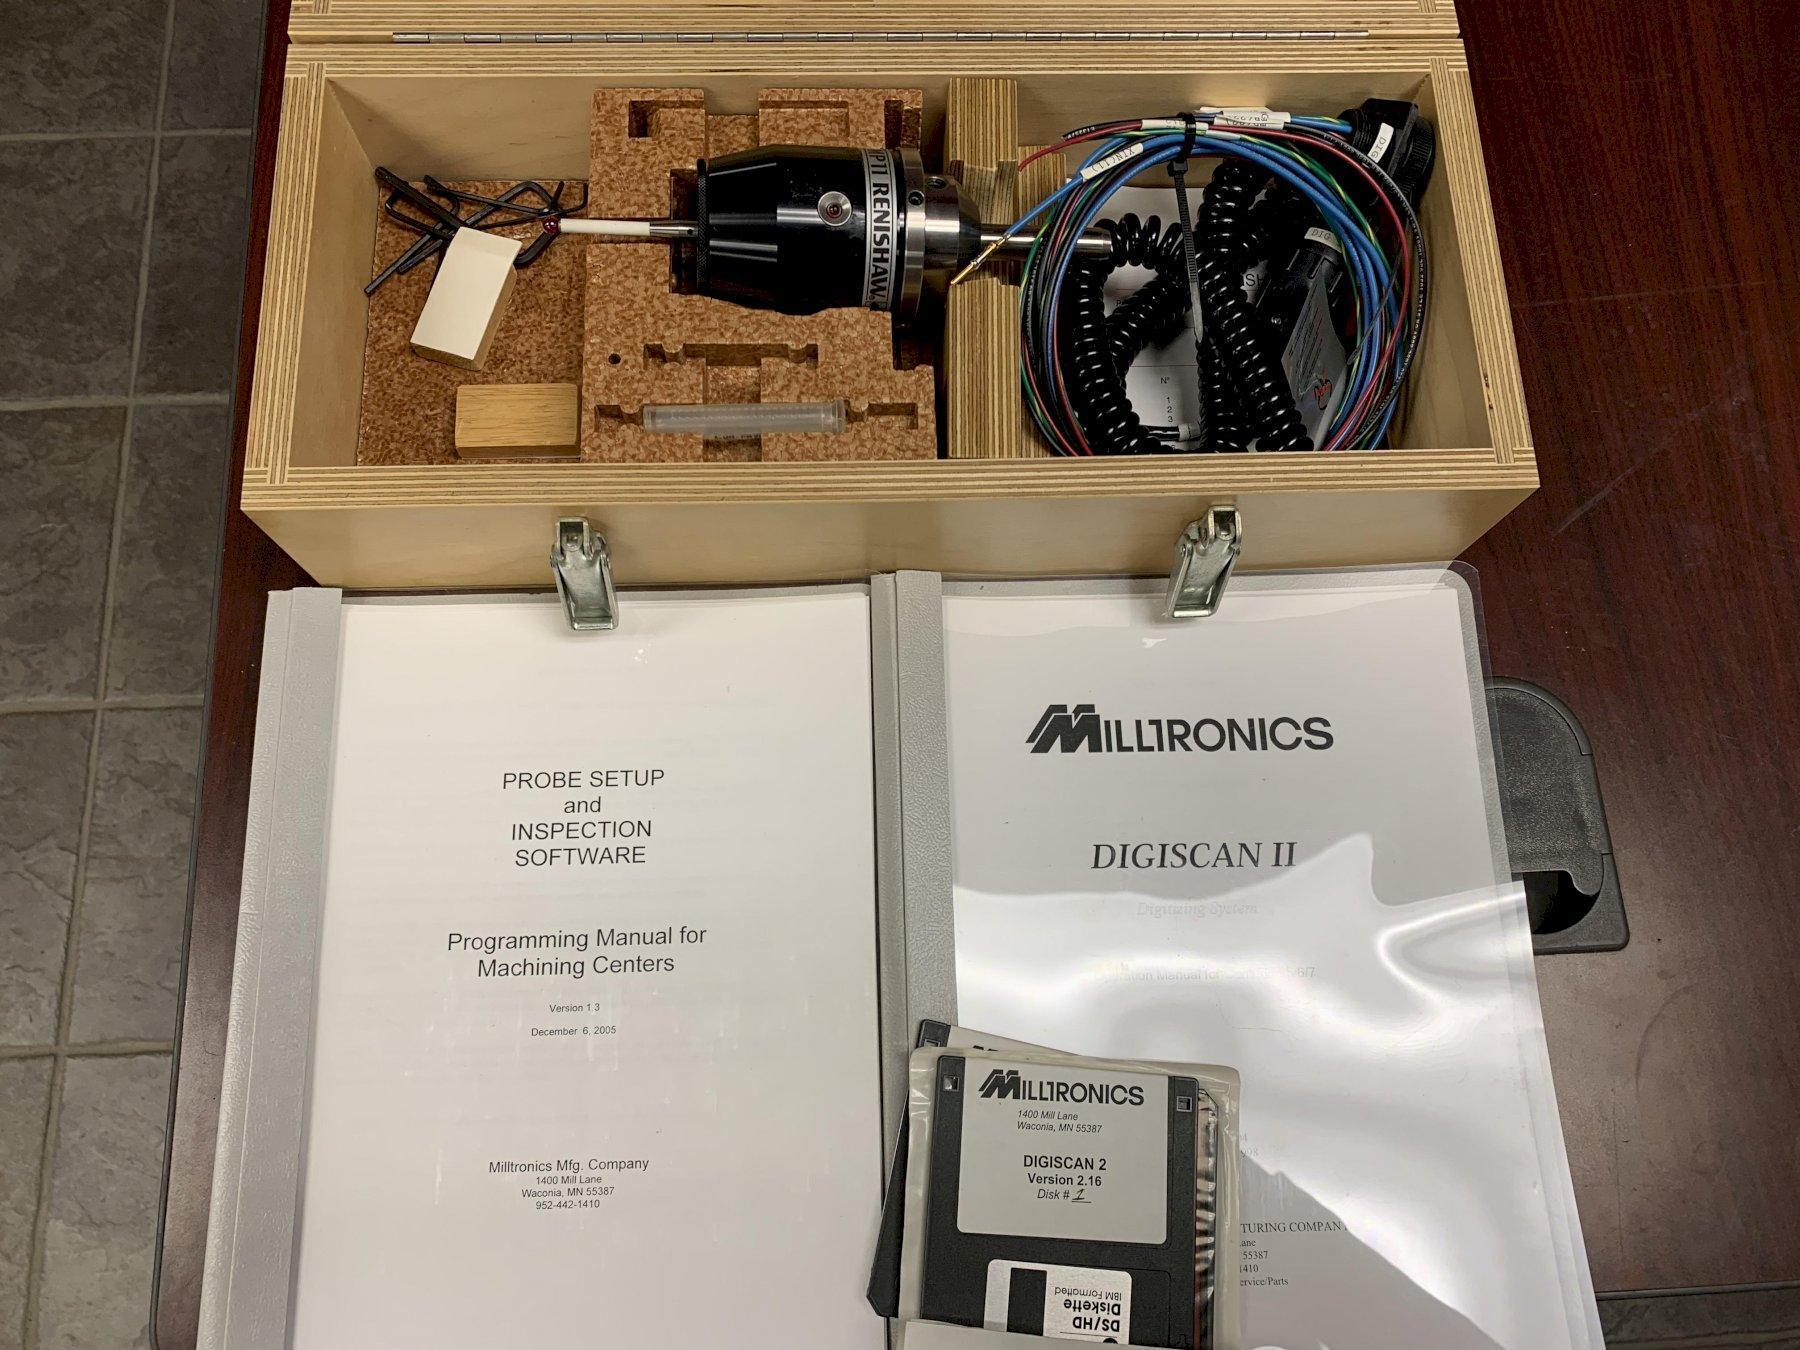 Milltronics Digiscan II Digitizing Probe / Renishaw MP11